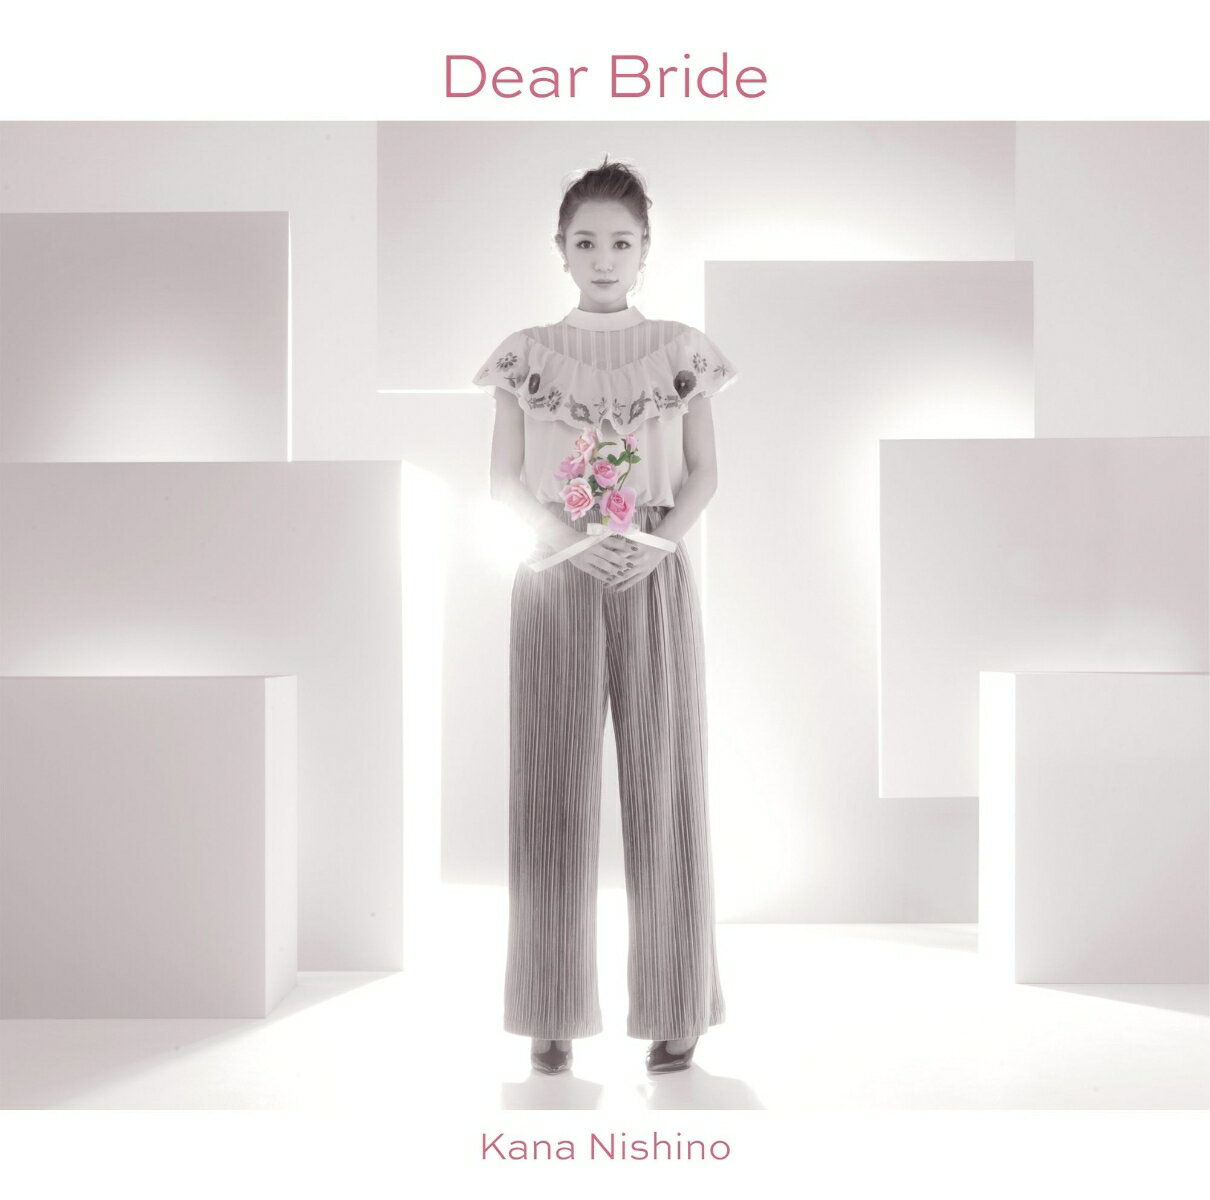 Dear Bride [ 西野カナ ]